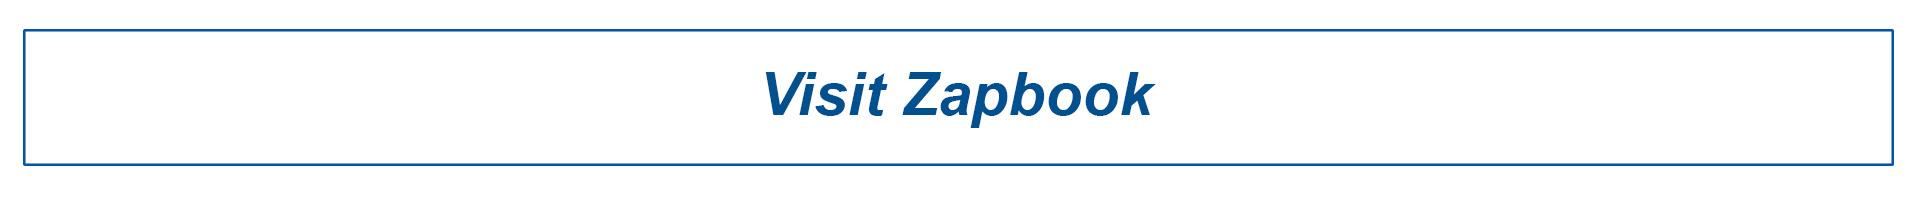 visit zap book